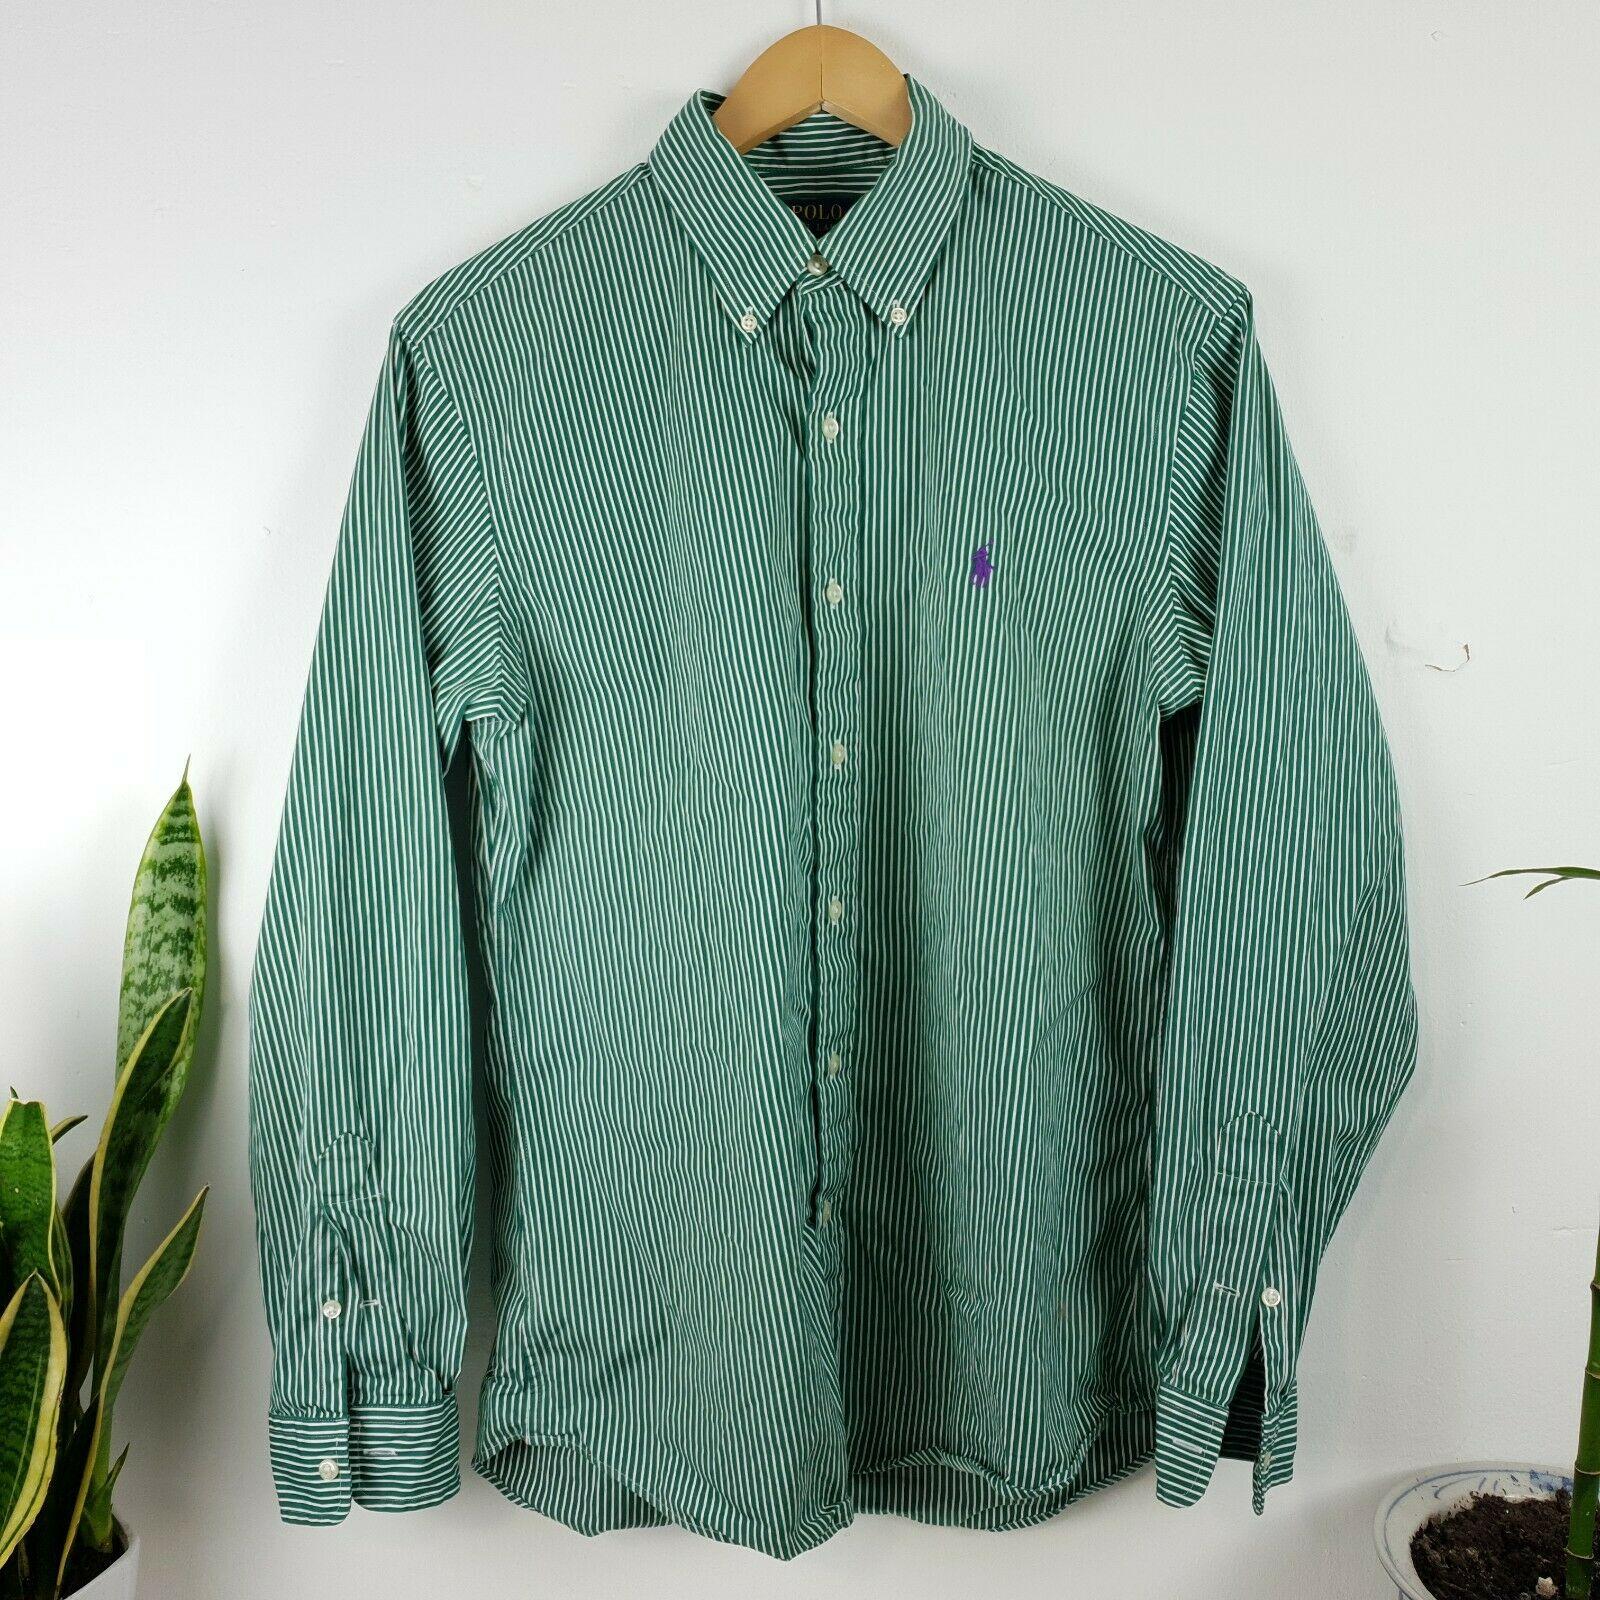 Mens Polo ralph lauren shirt Large green striped sleeved logo cust